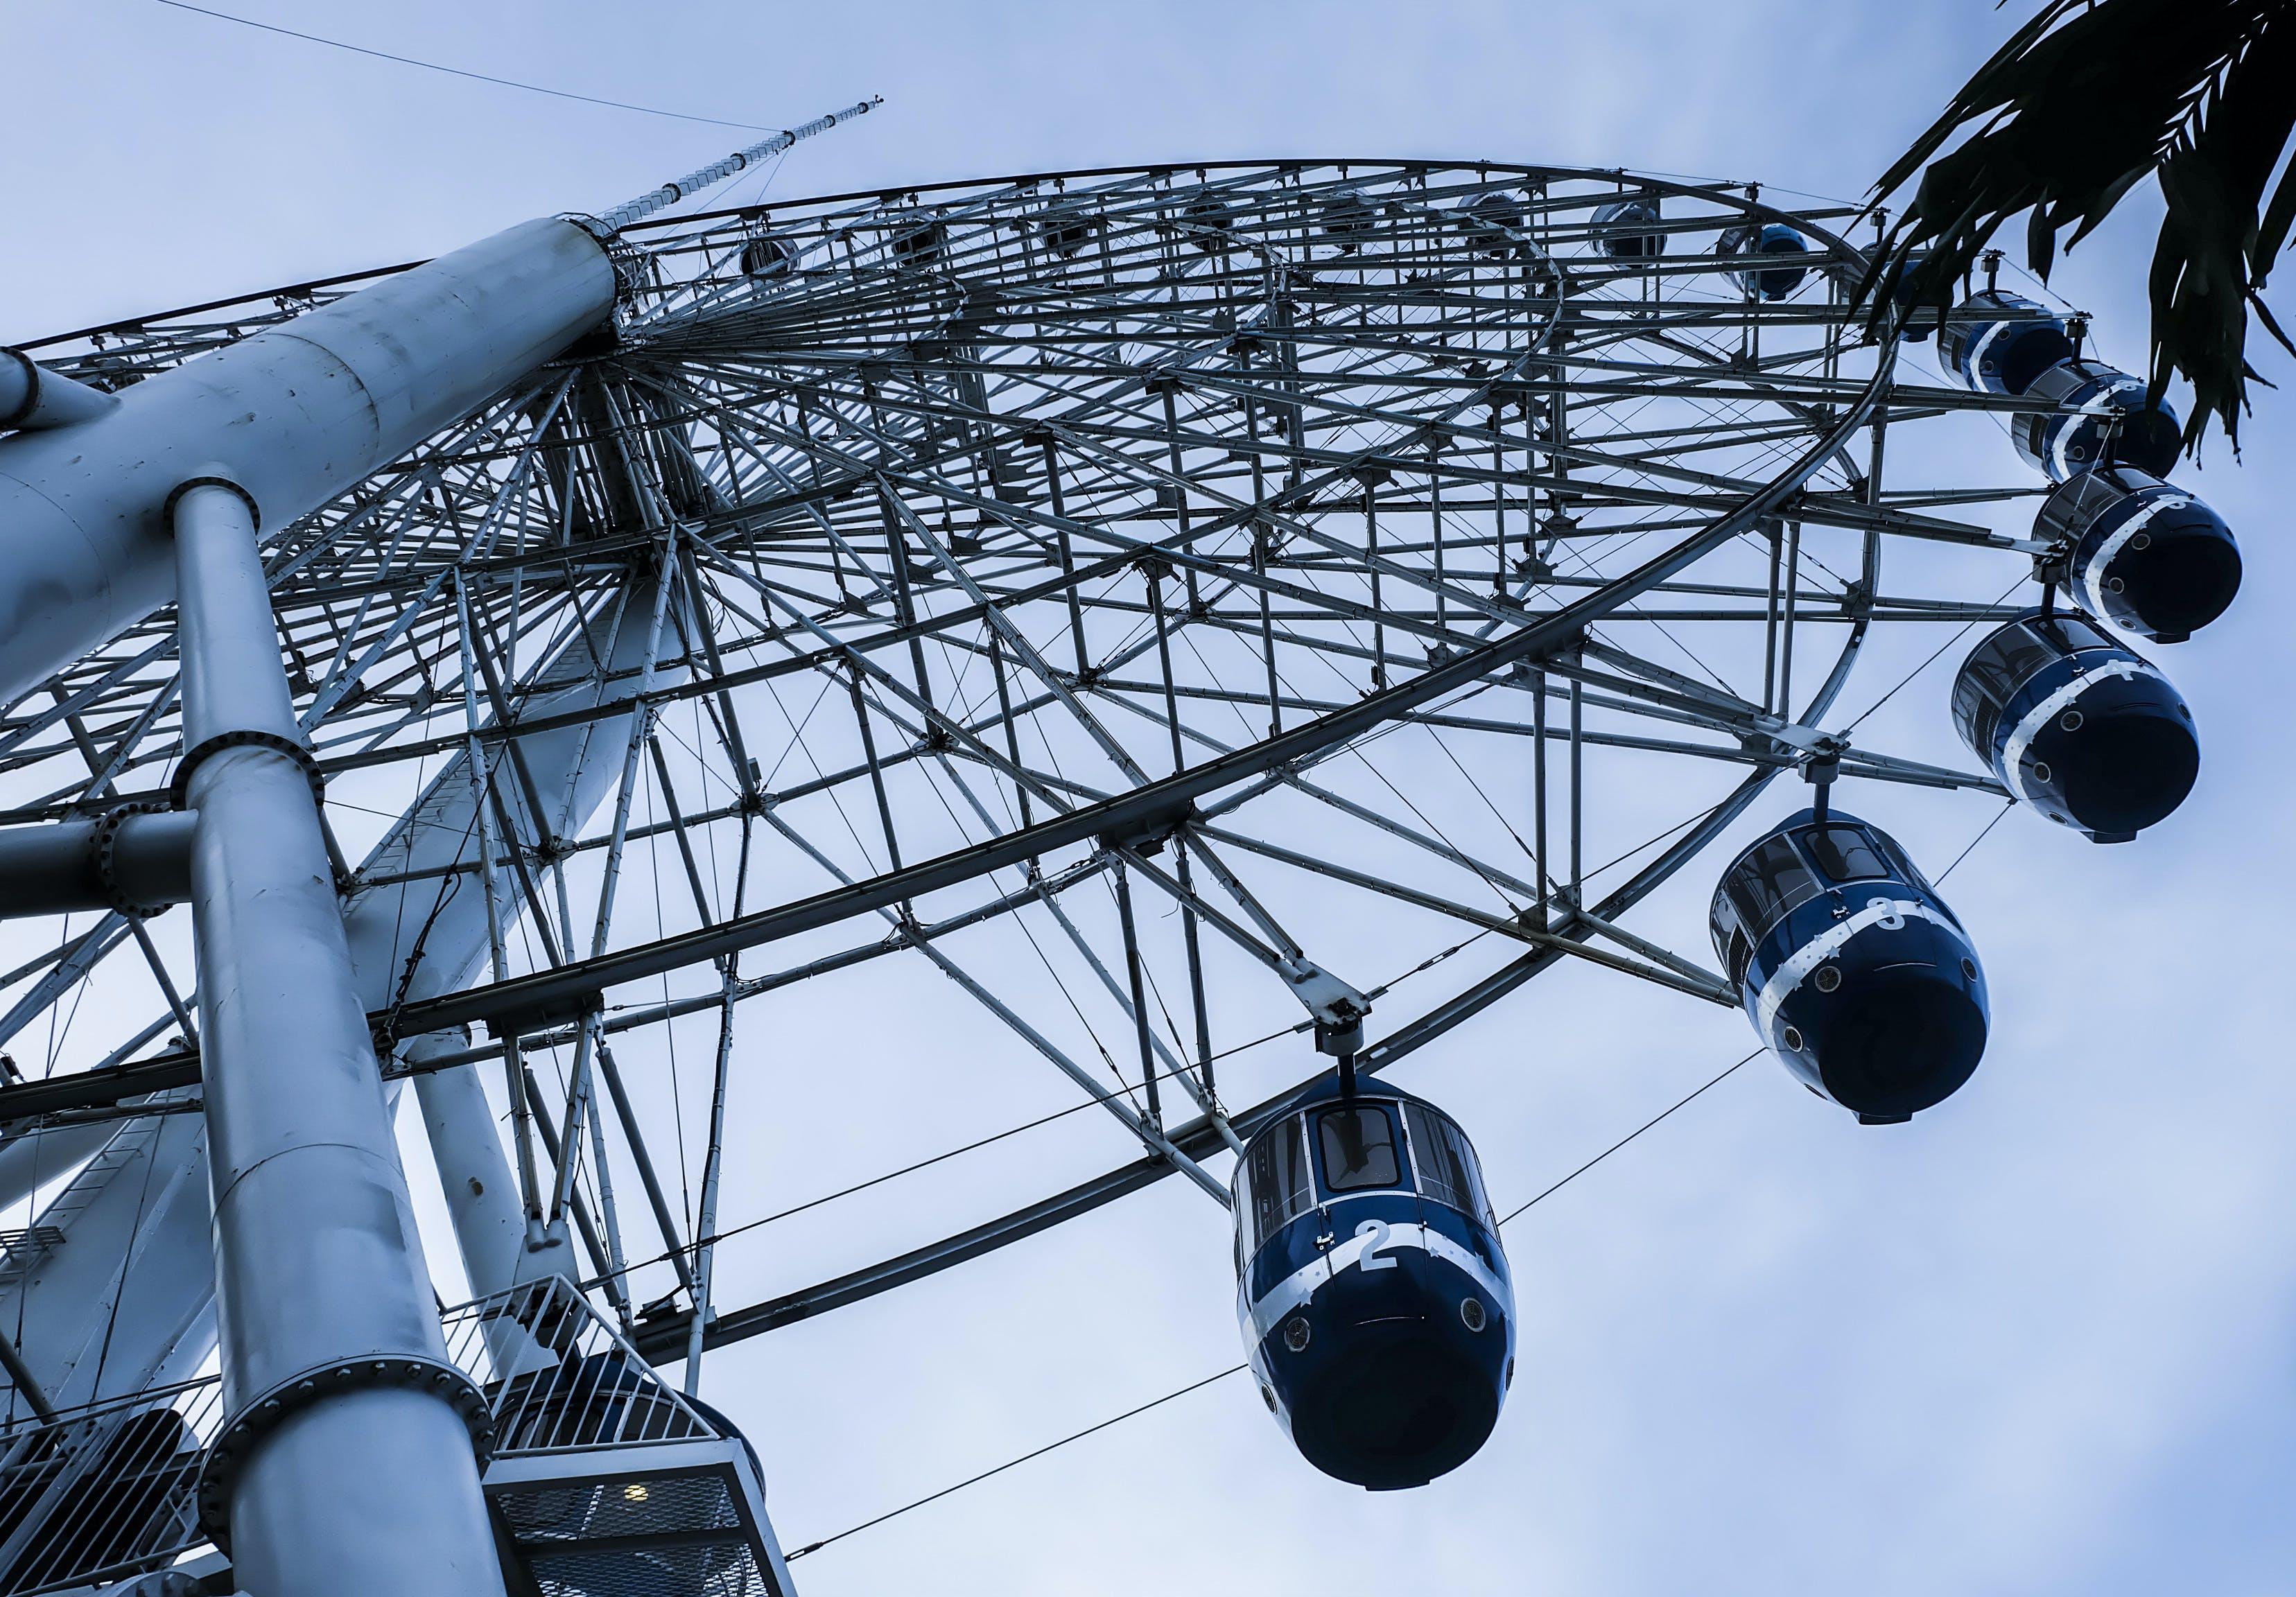 Free stock photo of amusement, amusement park, black and white, ferris wheel